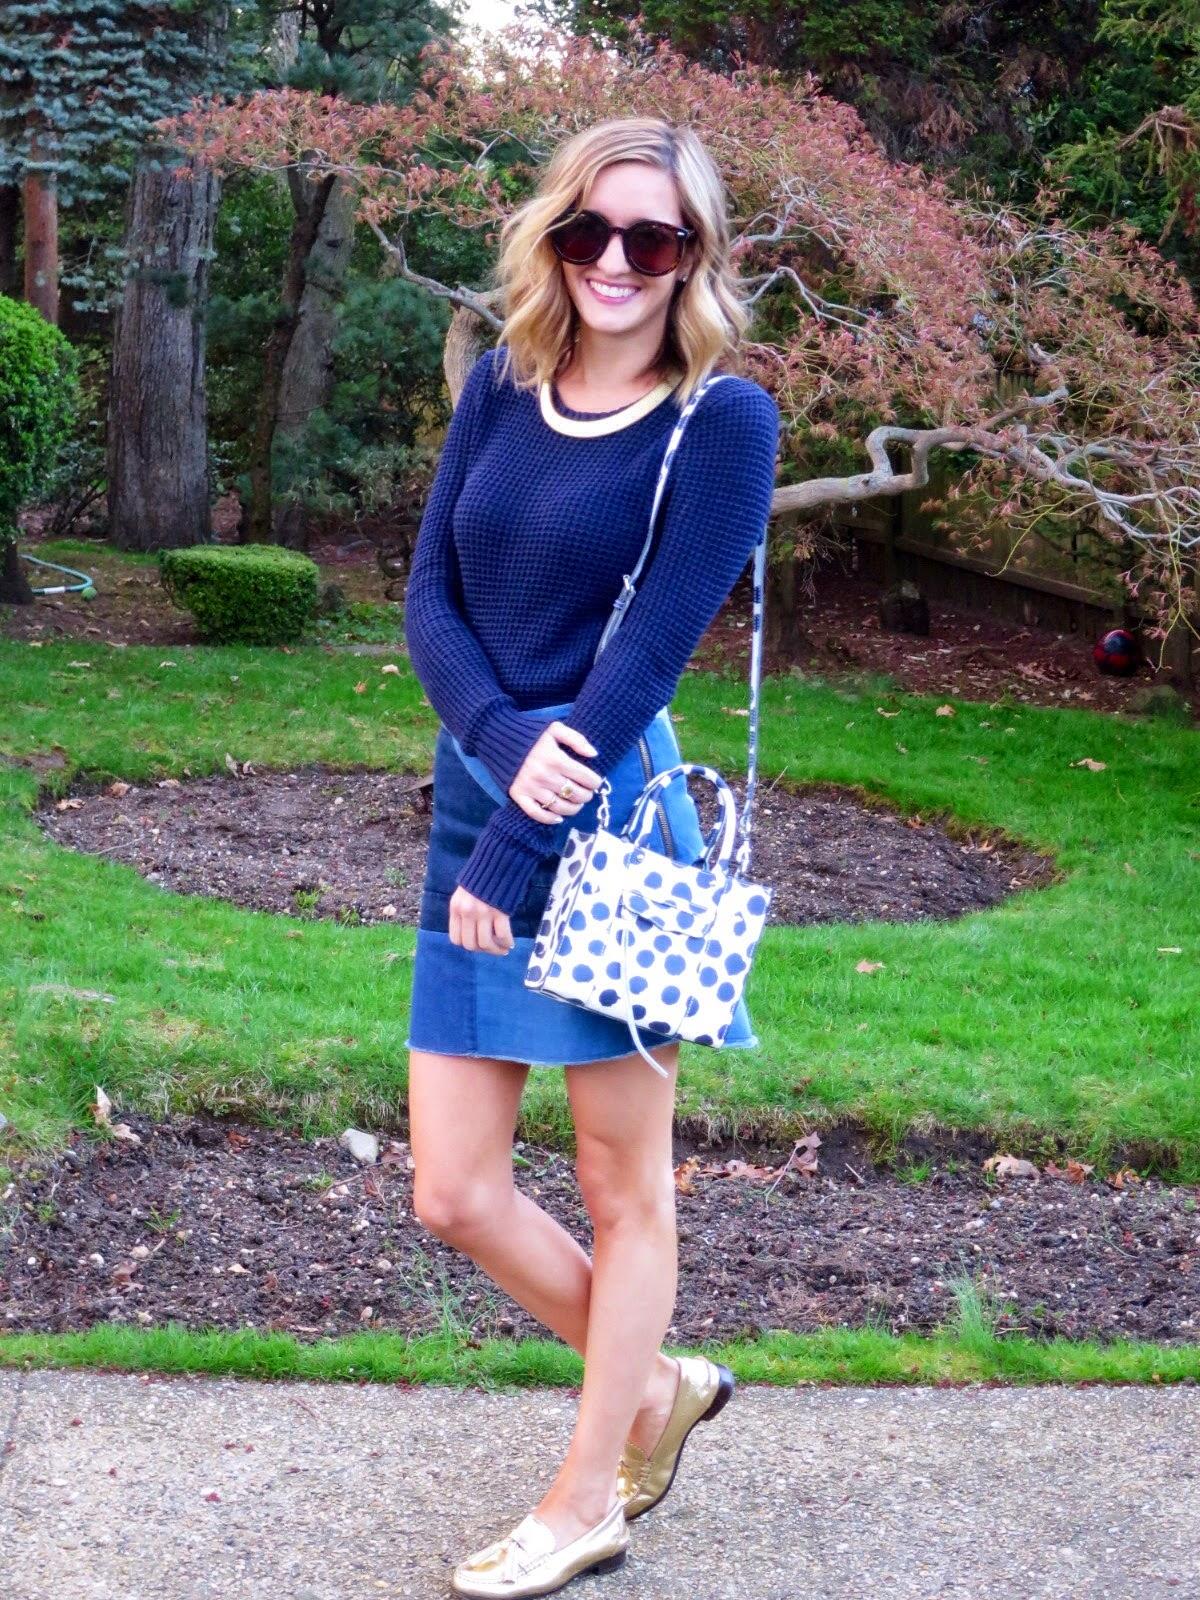 rebecca minkoff spotted bag